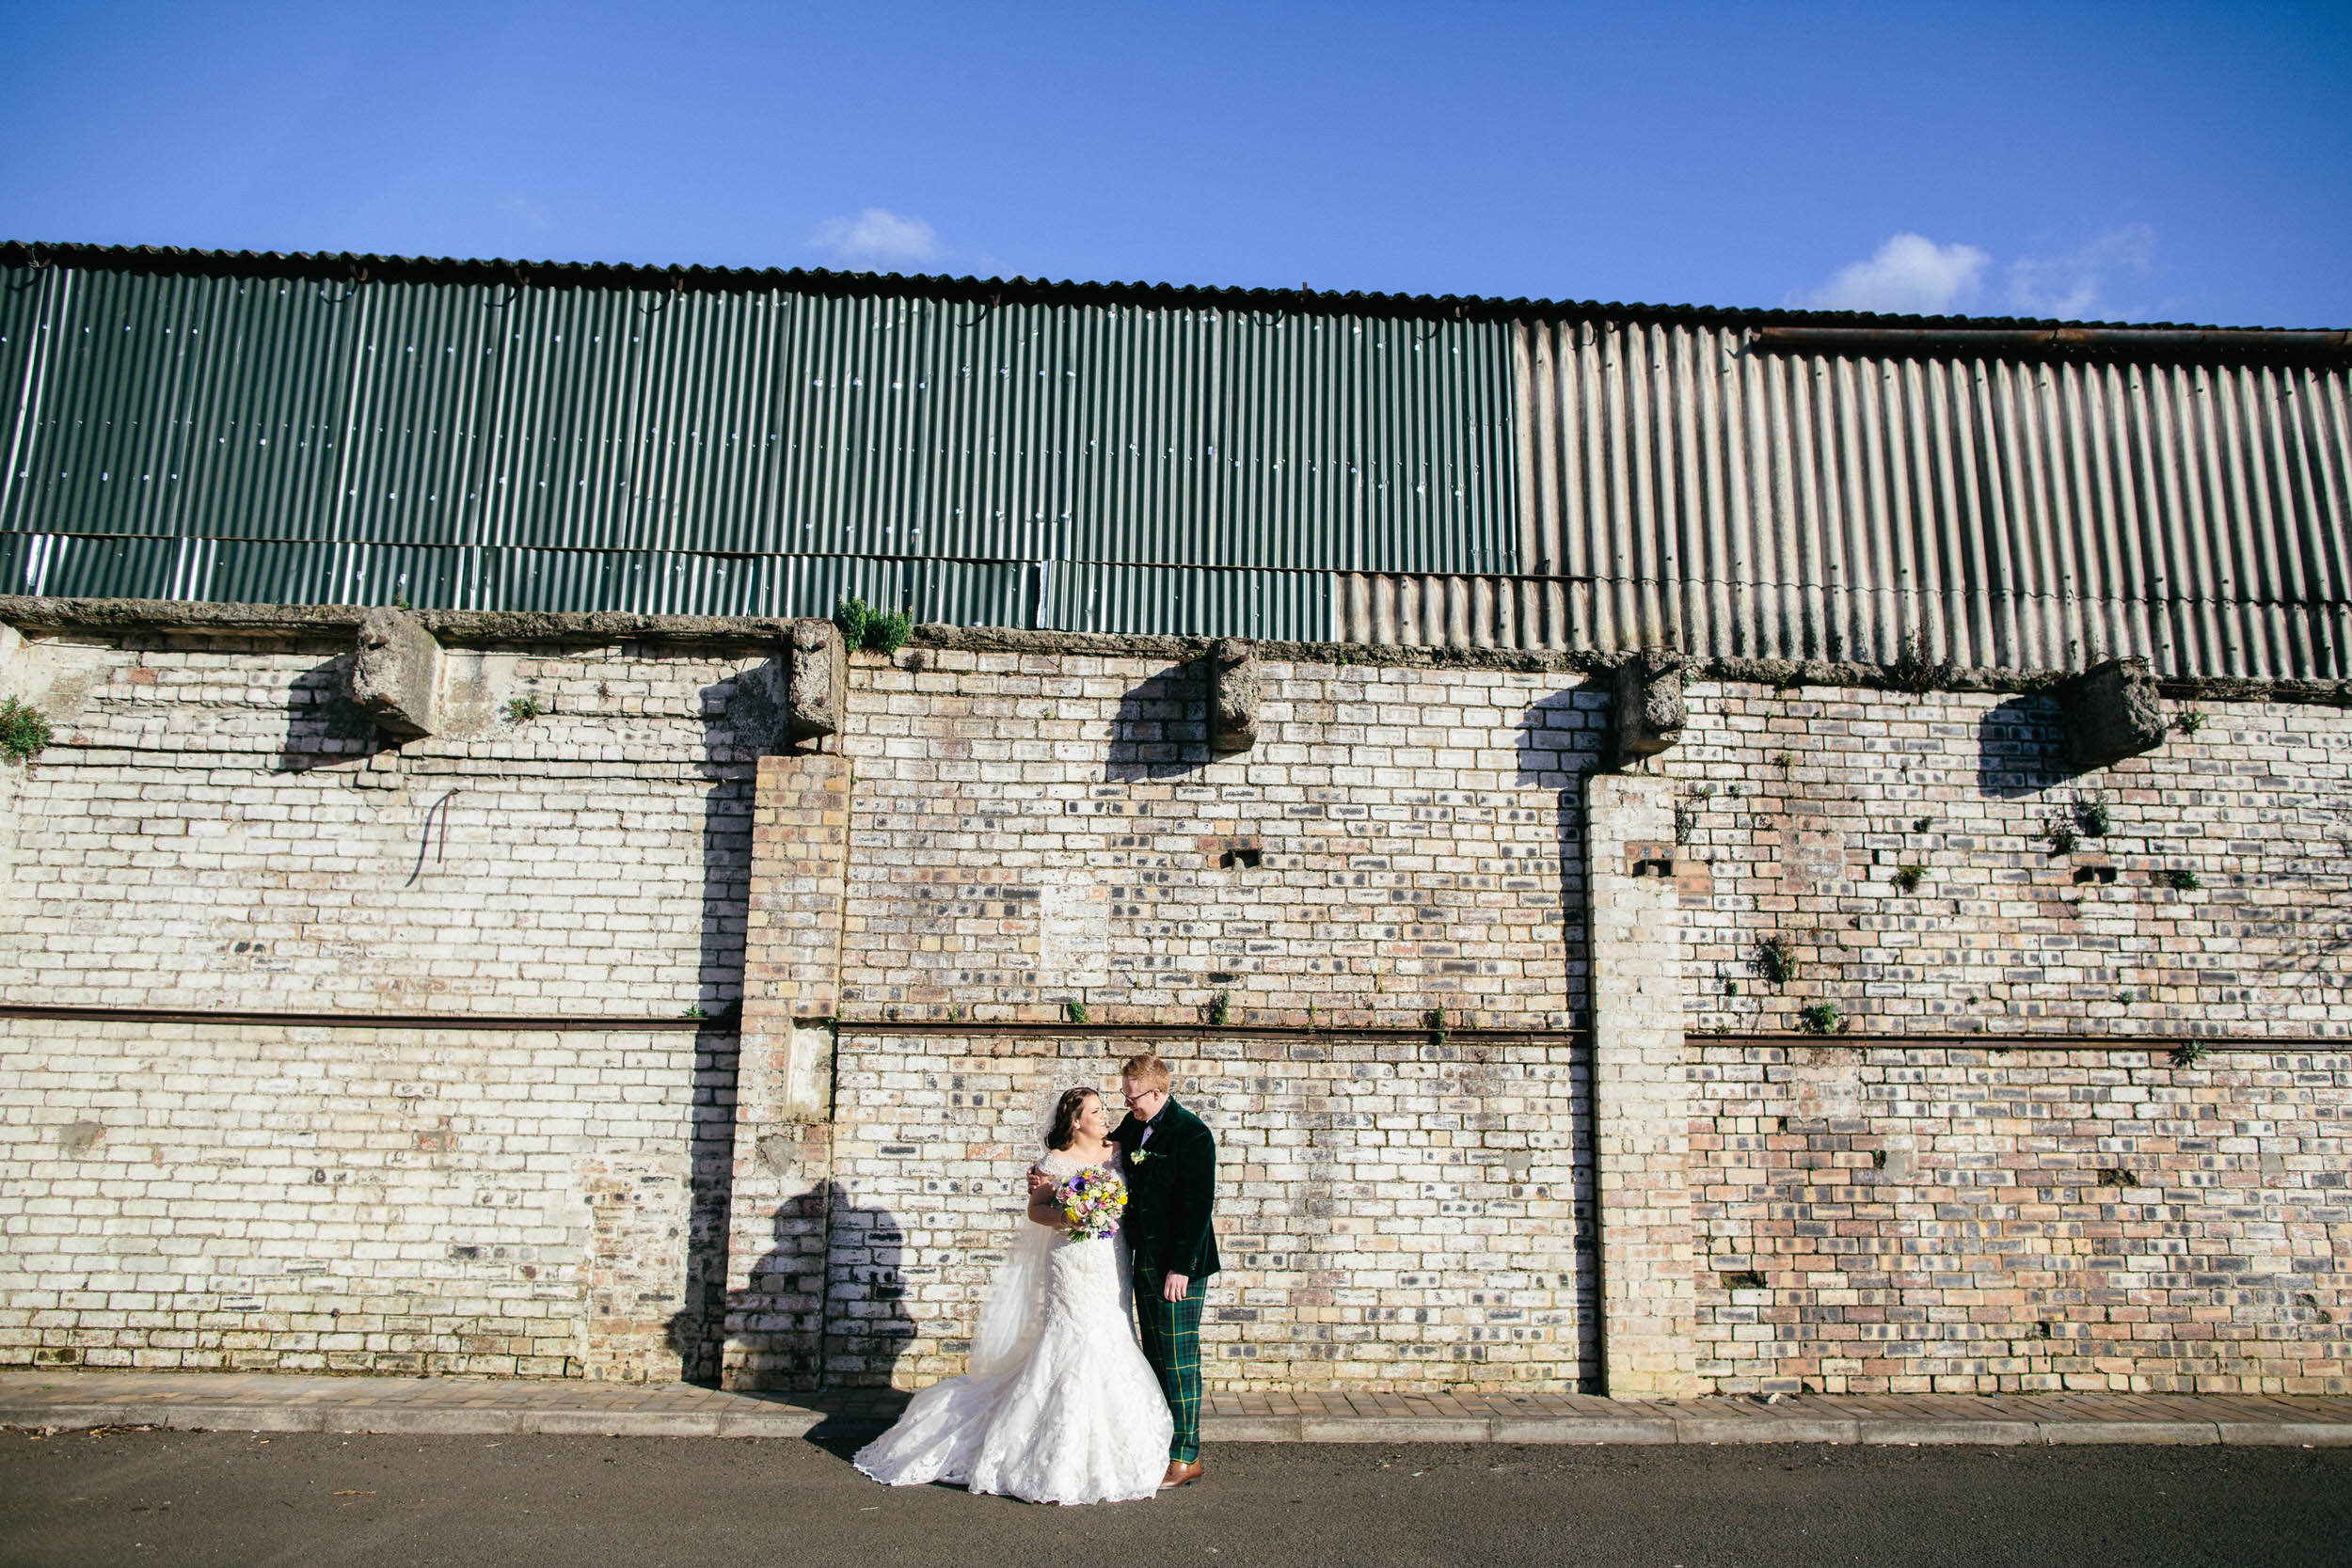 Quirky Wedding Photographer Scotland Glasgow Edinburgh Mirrorbox 024.jpg